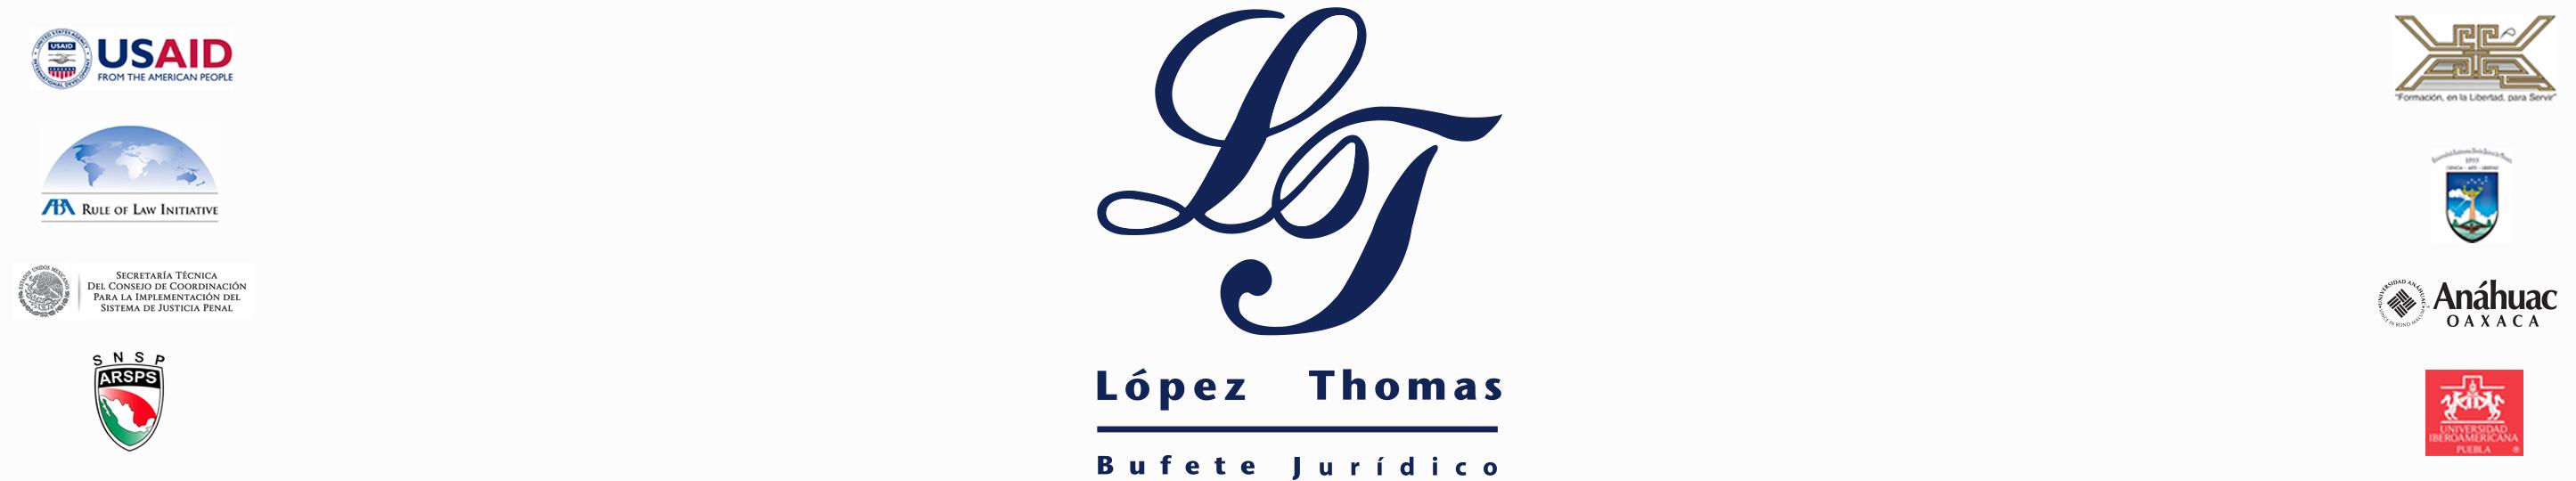 Bufete Jurídico López Thomas Logo